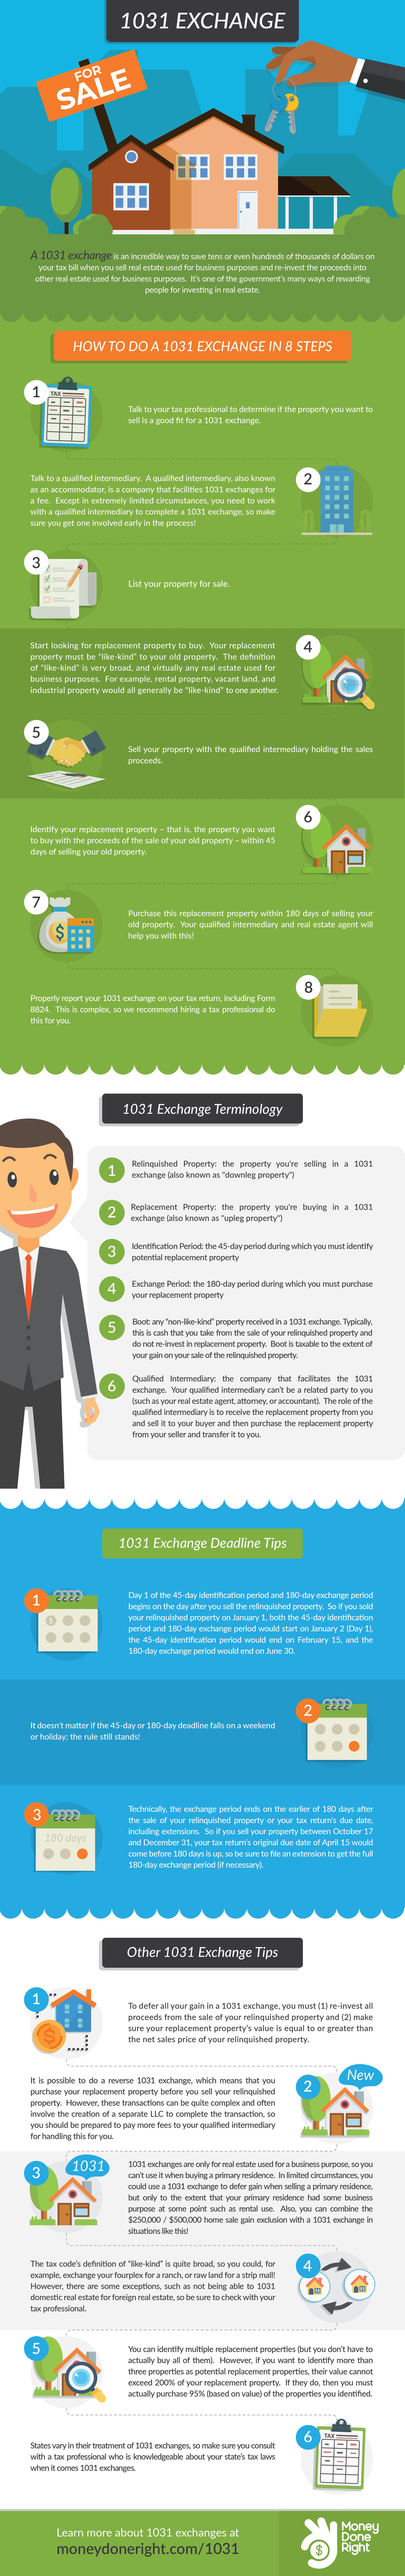 1031 Exchange Rules Nj